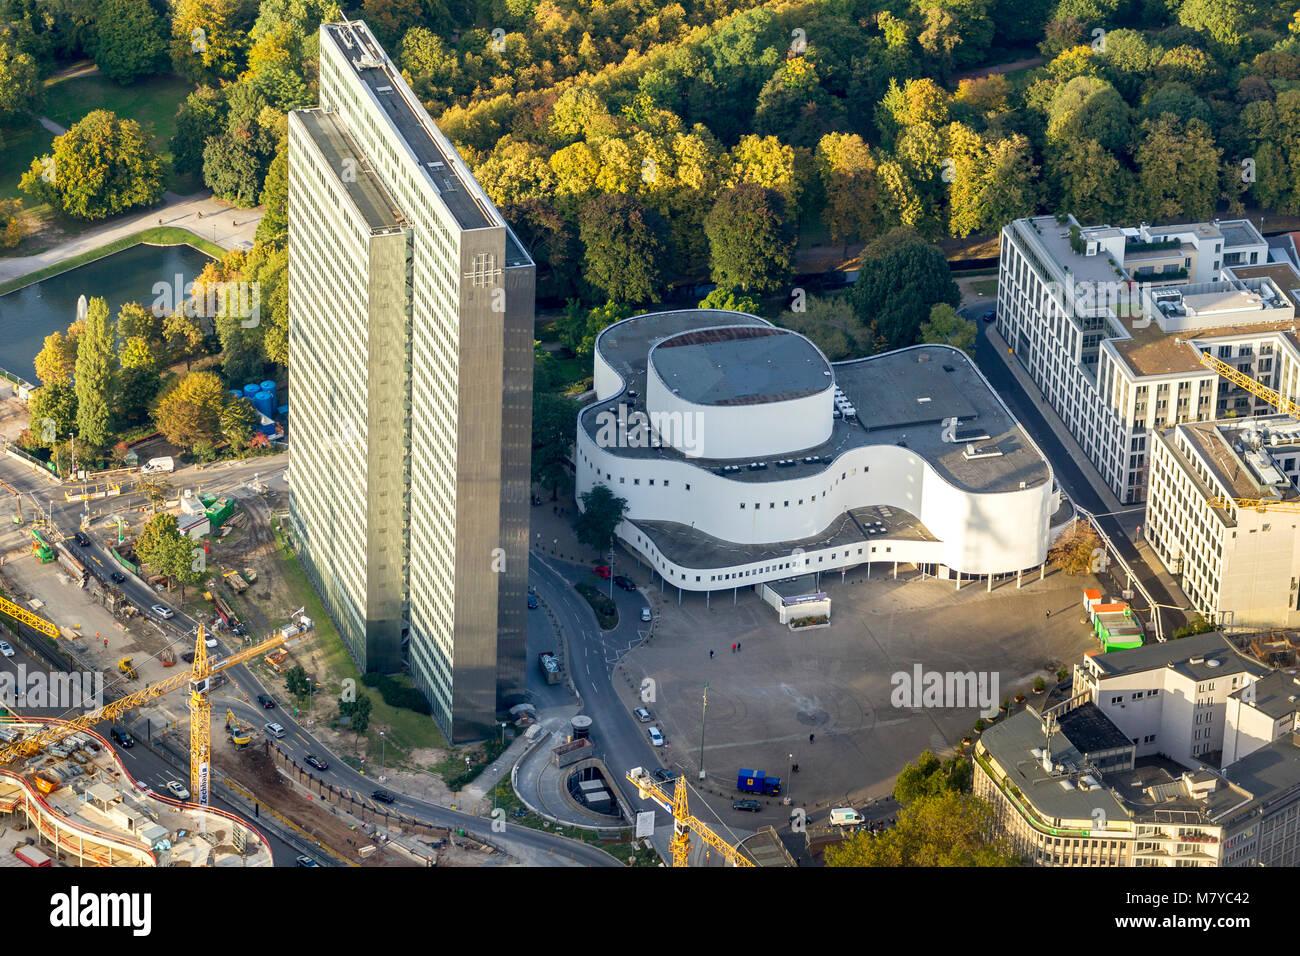 Aerial view, Dreischeibenhaus, Gustaf-Gründgens Square, Playhouse, Playhouse, Duesseldorf, Rhineland, North - Stock Image